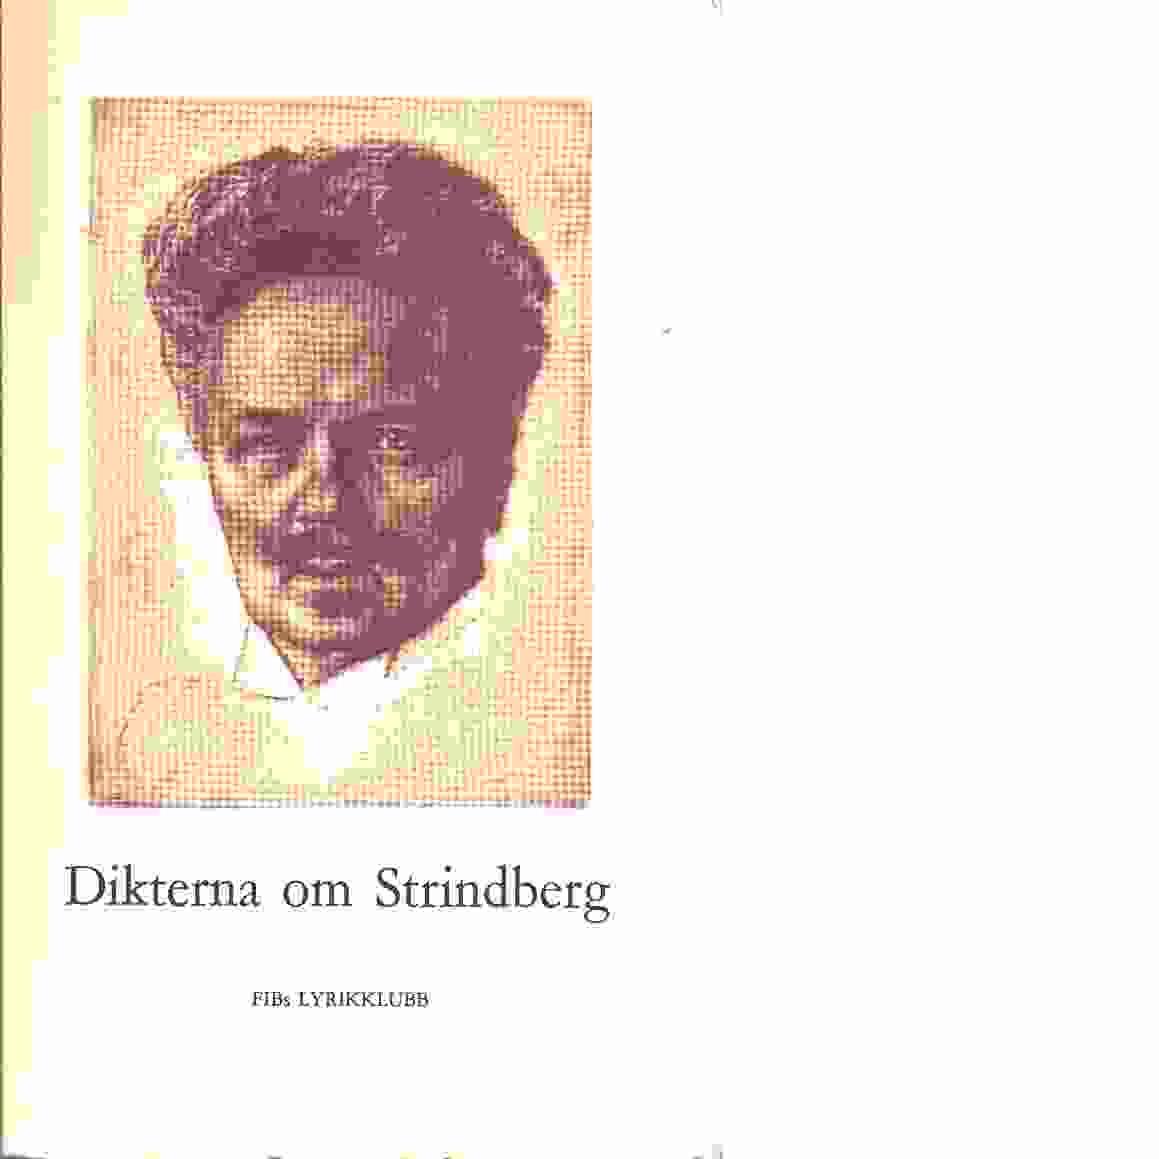 Dikterna om Strindberg - Red. Svensson, Harald